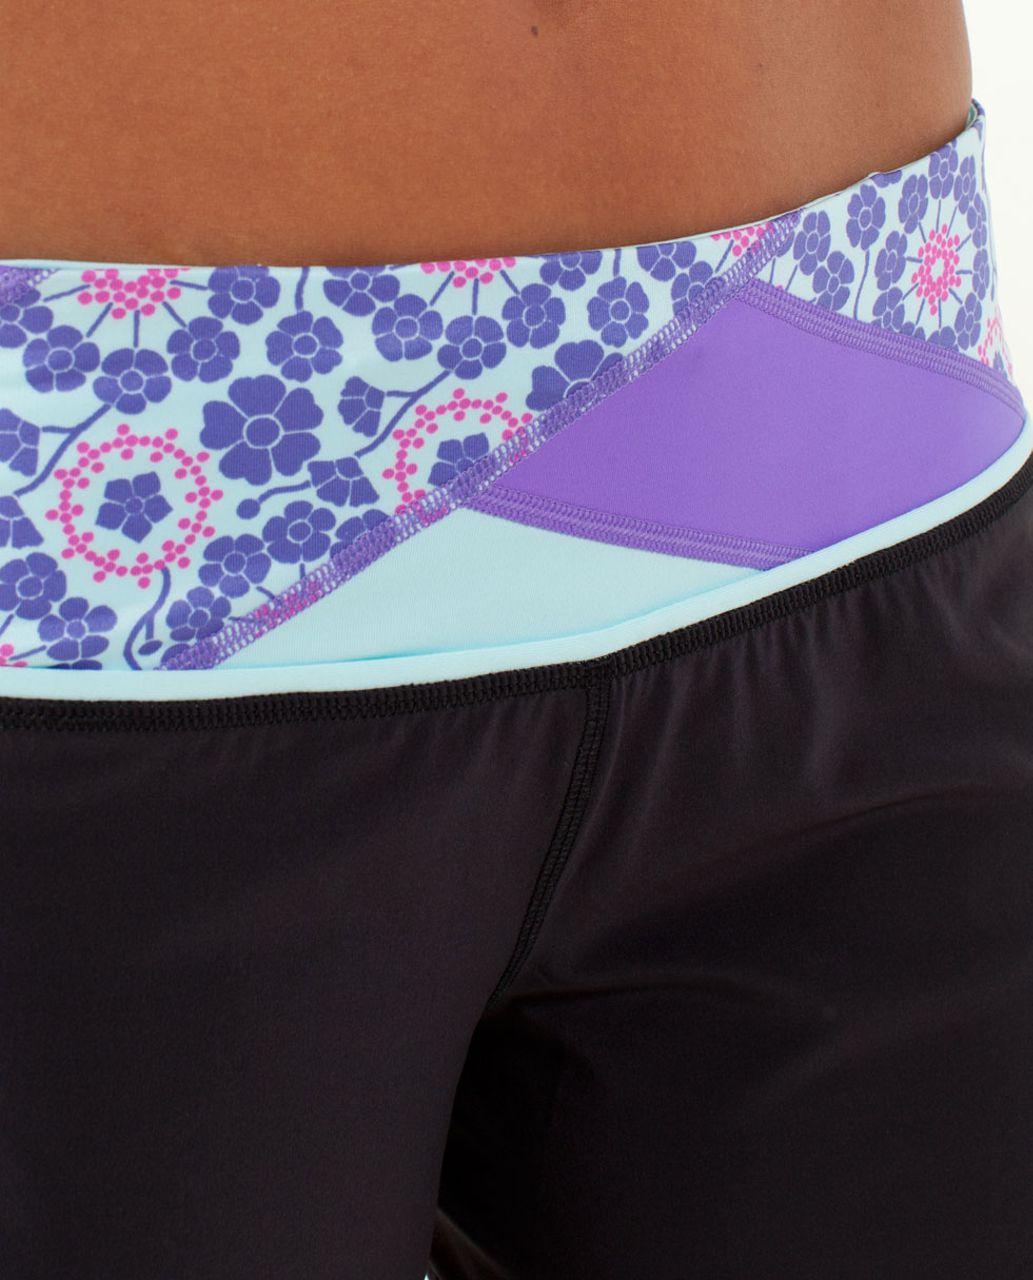 Lululemon Groovy Run Short - Black / Quilt Summer13 5 / Power Purple